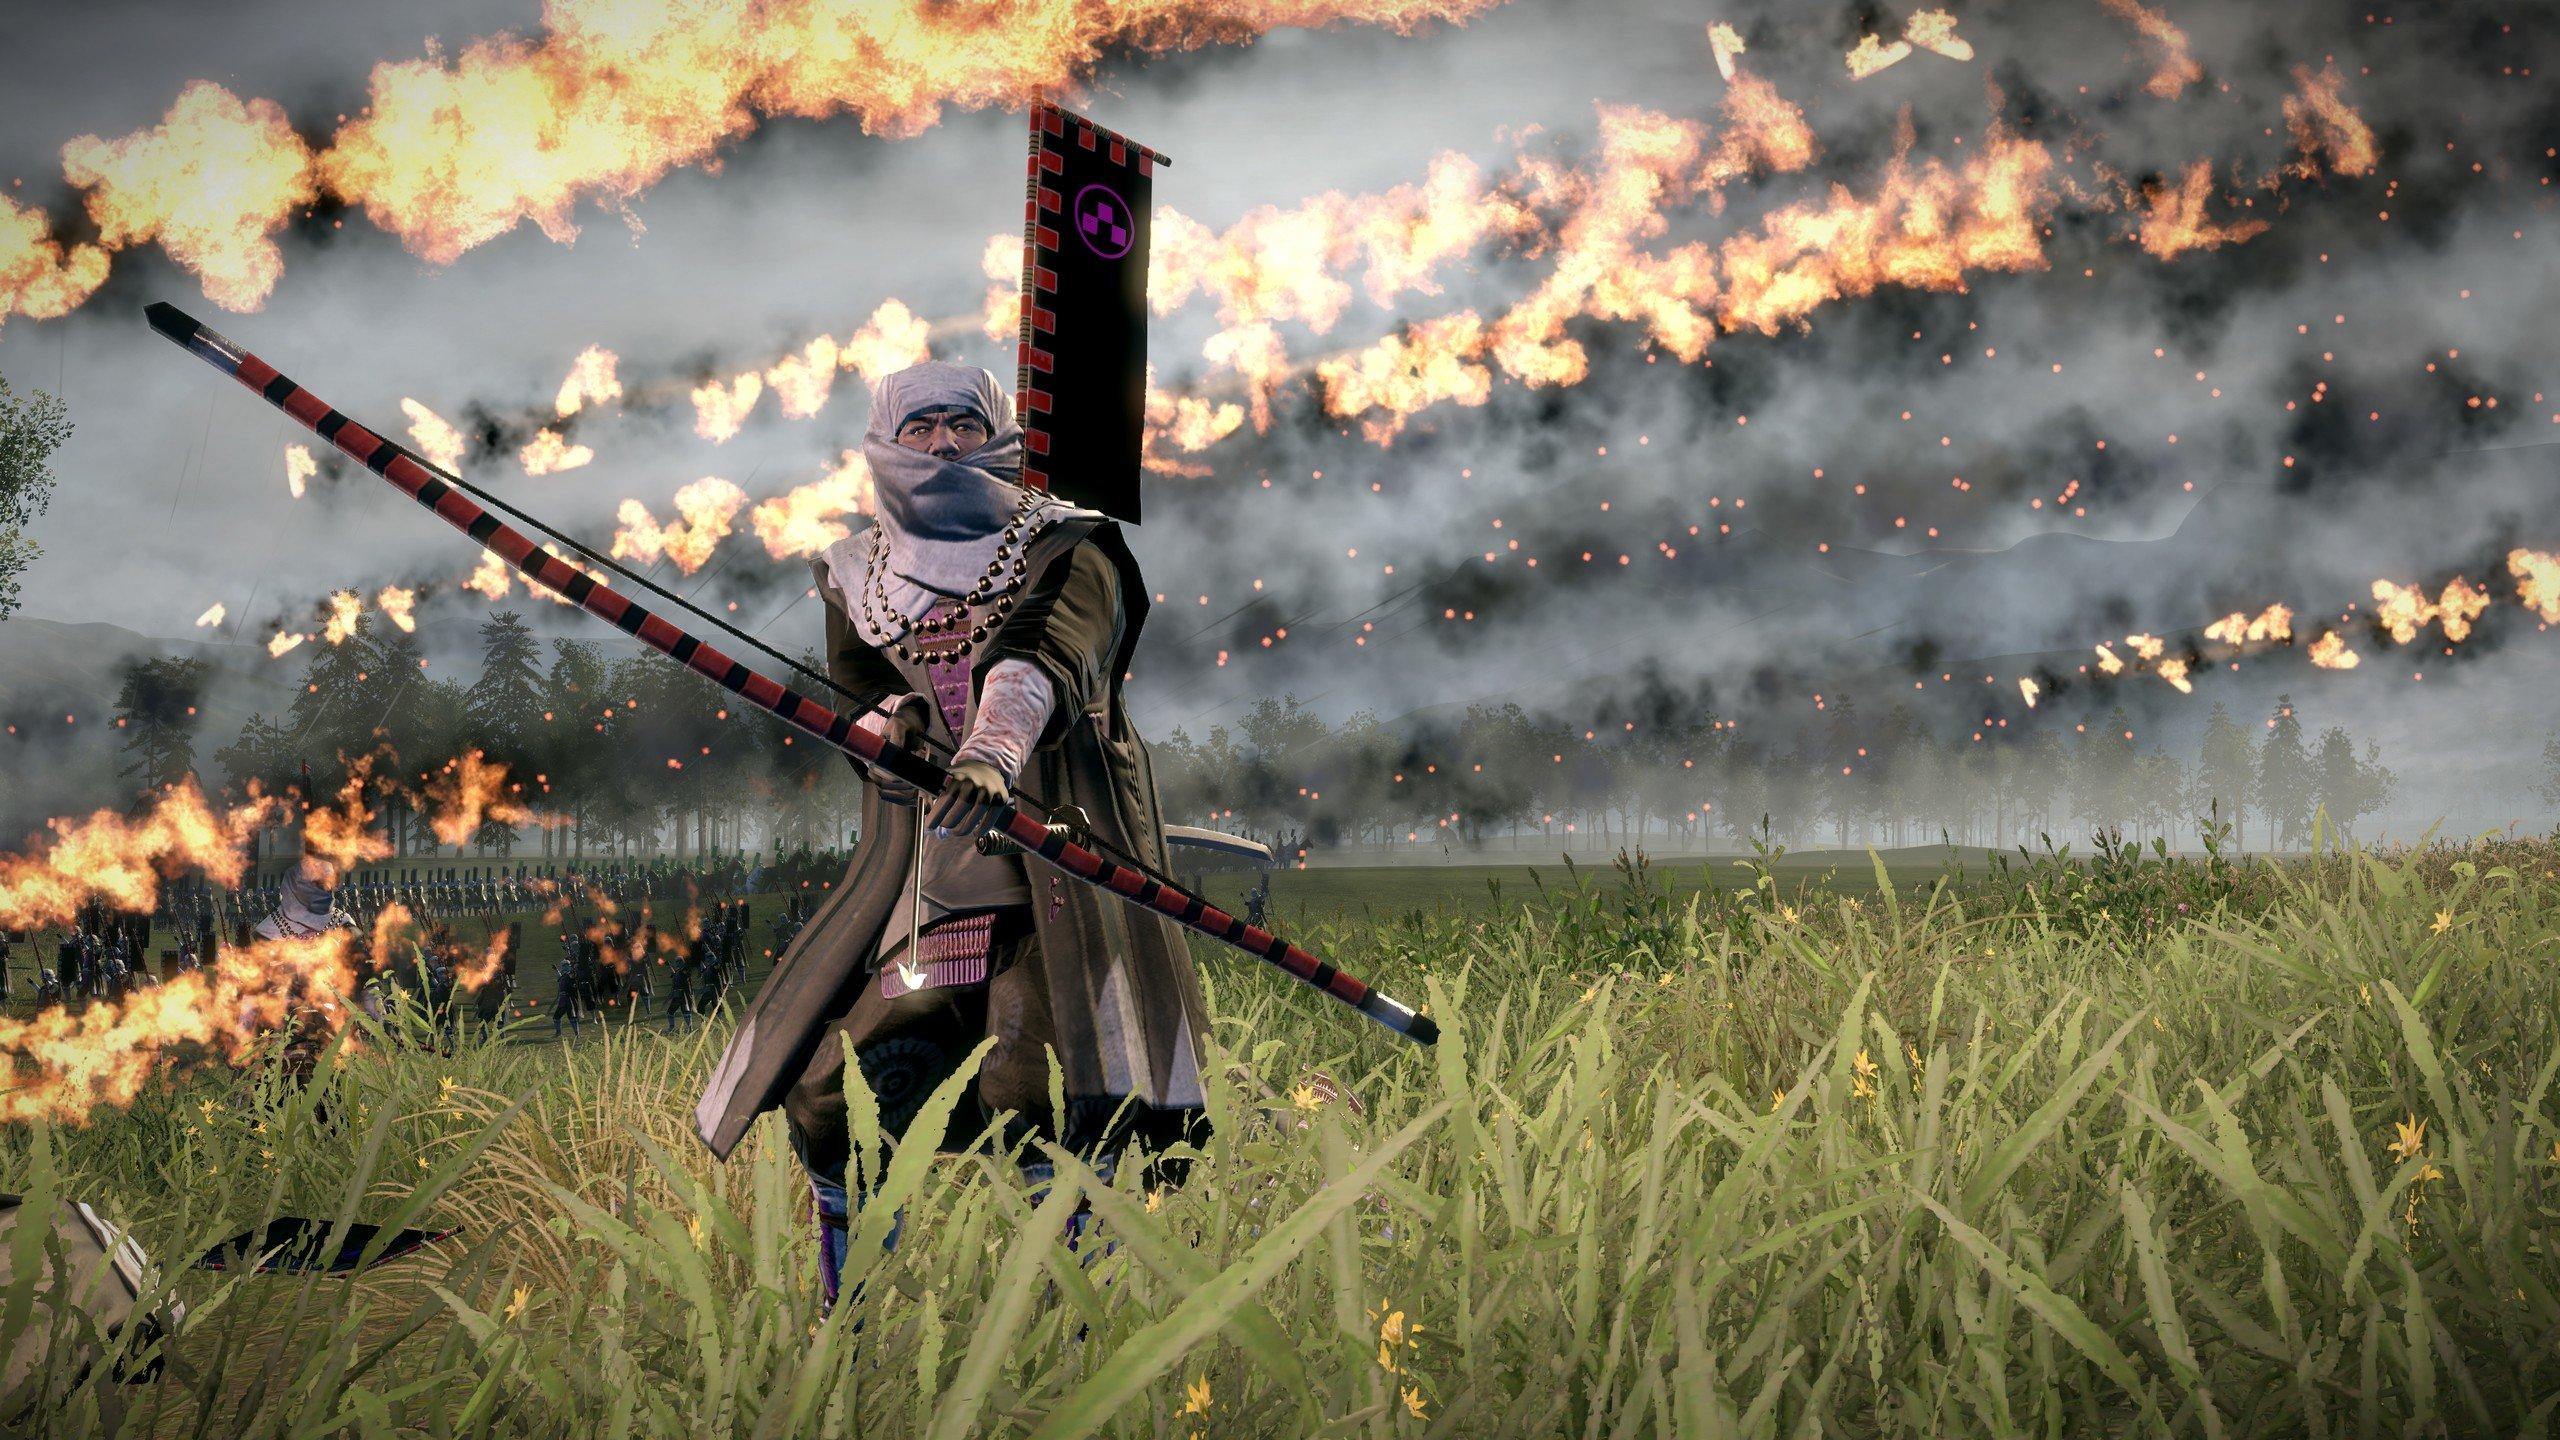 total war: shogun 2 wallpapers hd for desktop backgrounds